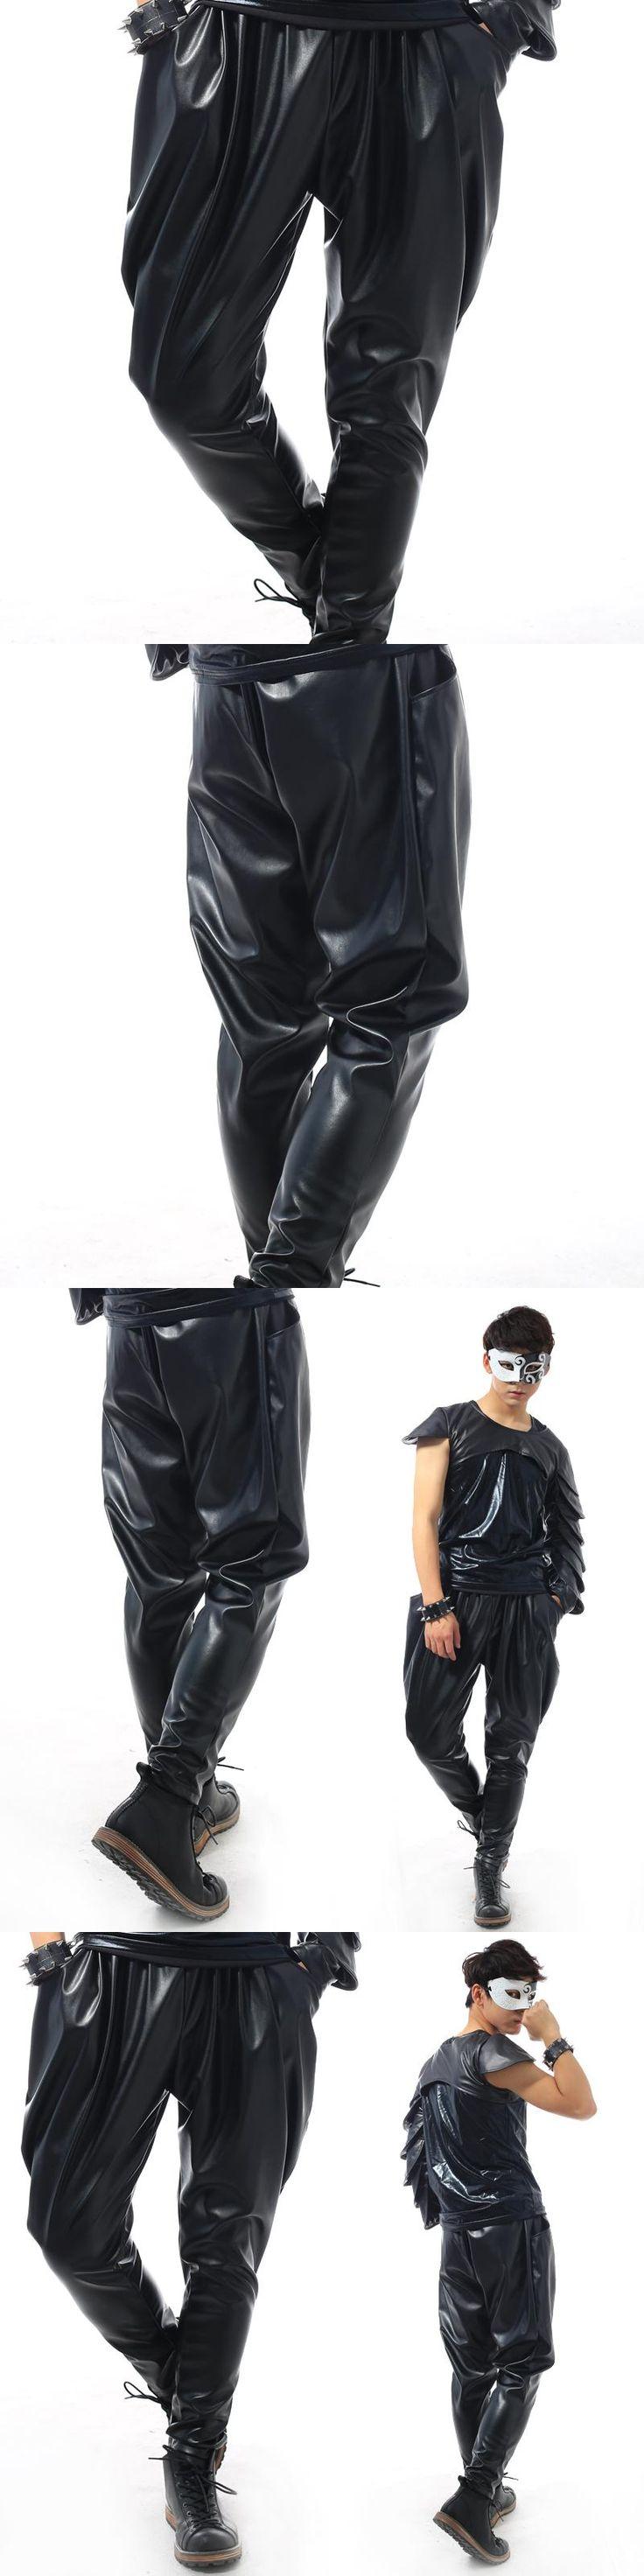 Stage personality men leather pants harem pant men feet trousers singer dance rock fashion elasticity street star style black